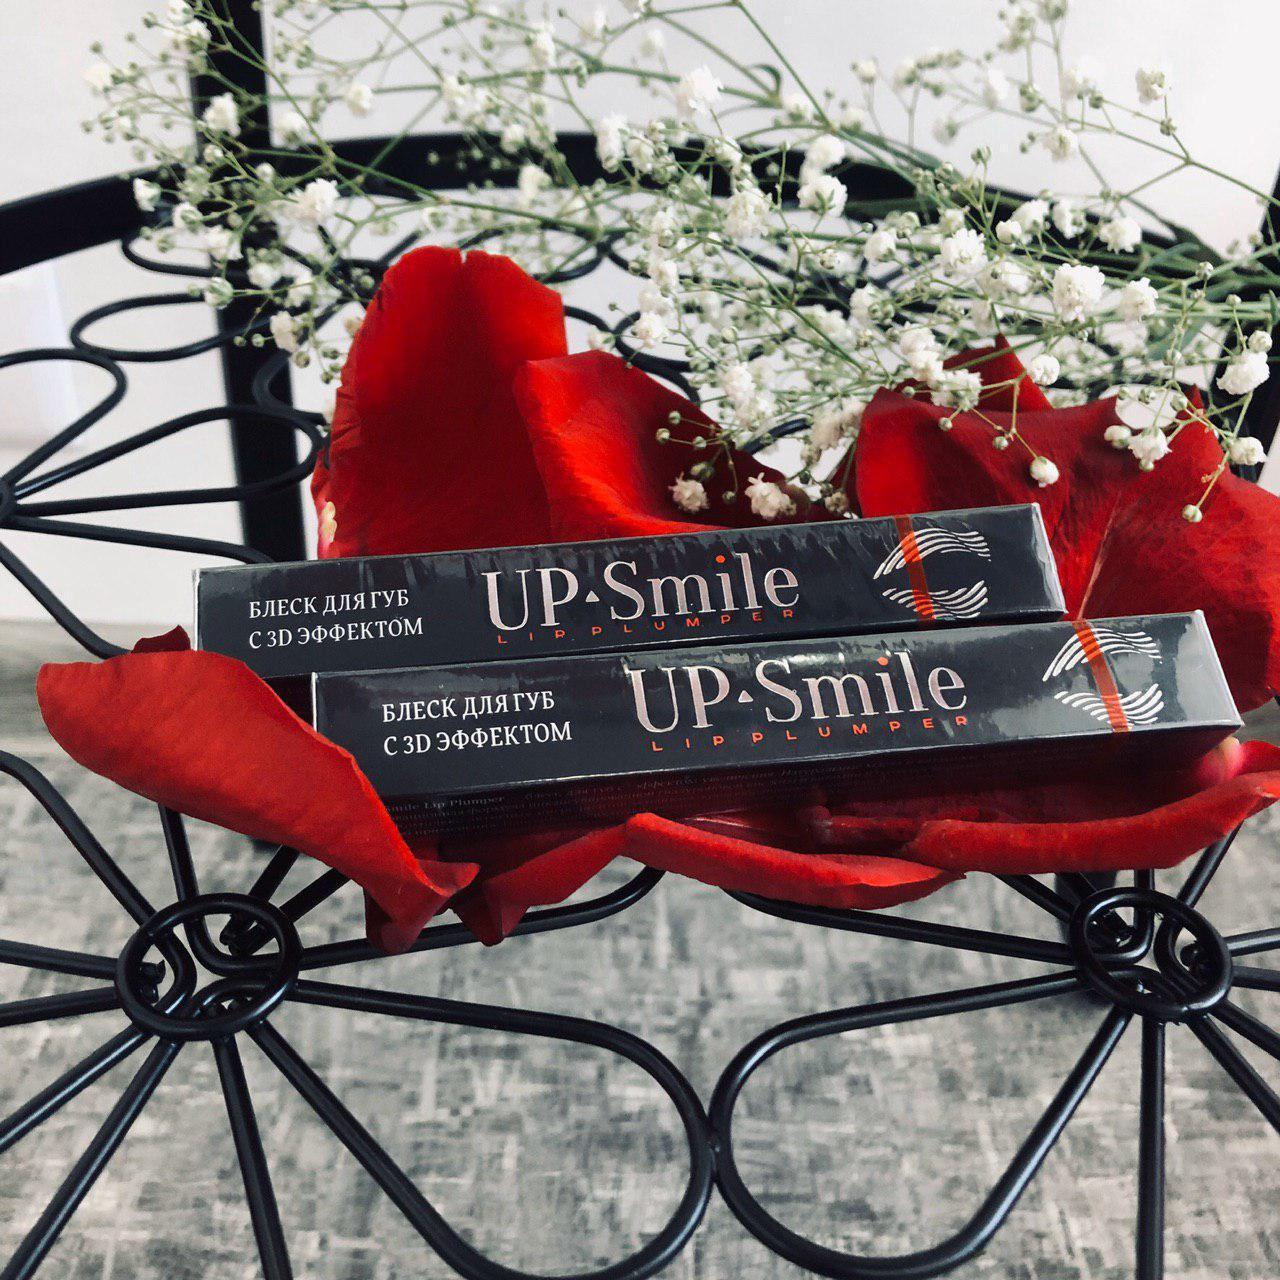 Блеск для губ с 3D эффектом Up-Smile от White&Smile